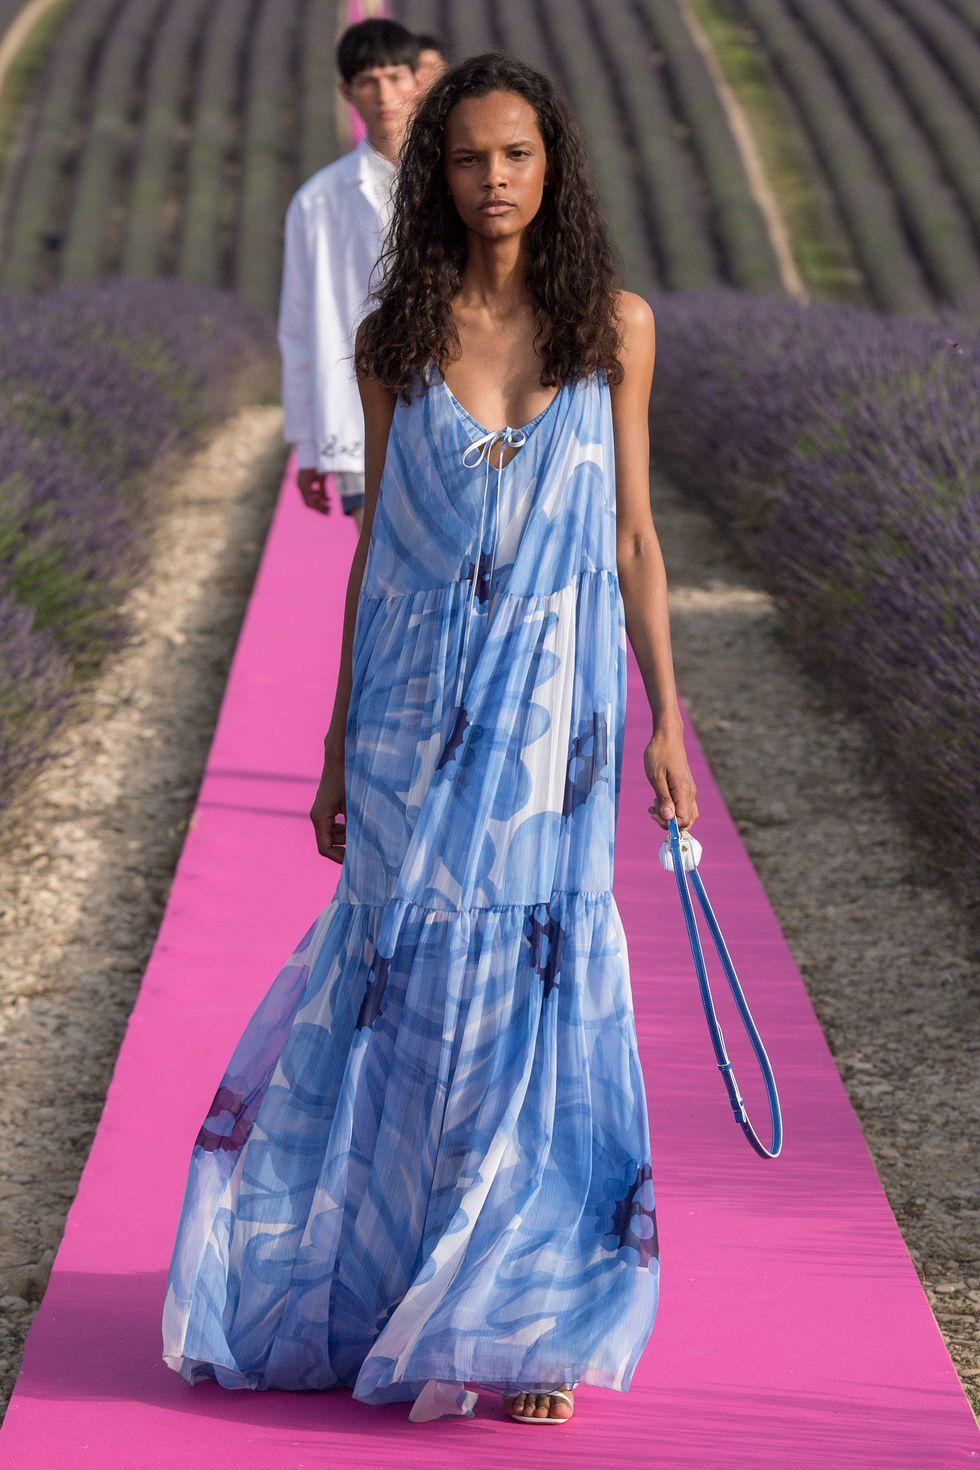 TREND ESTATE 2020 – STRAPLESS DRESS